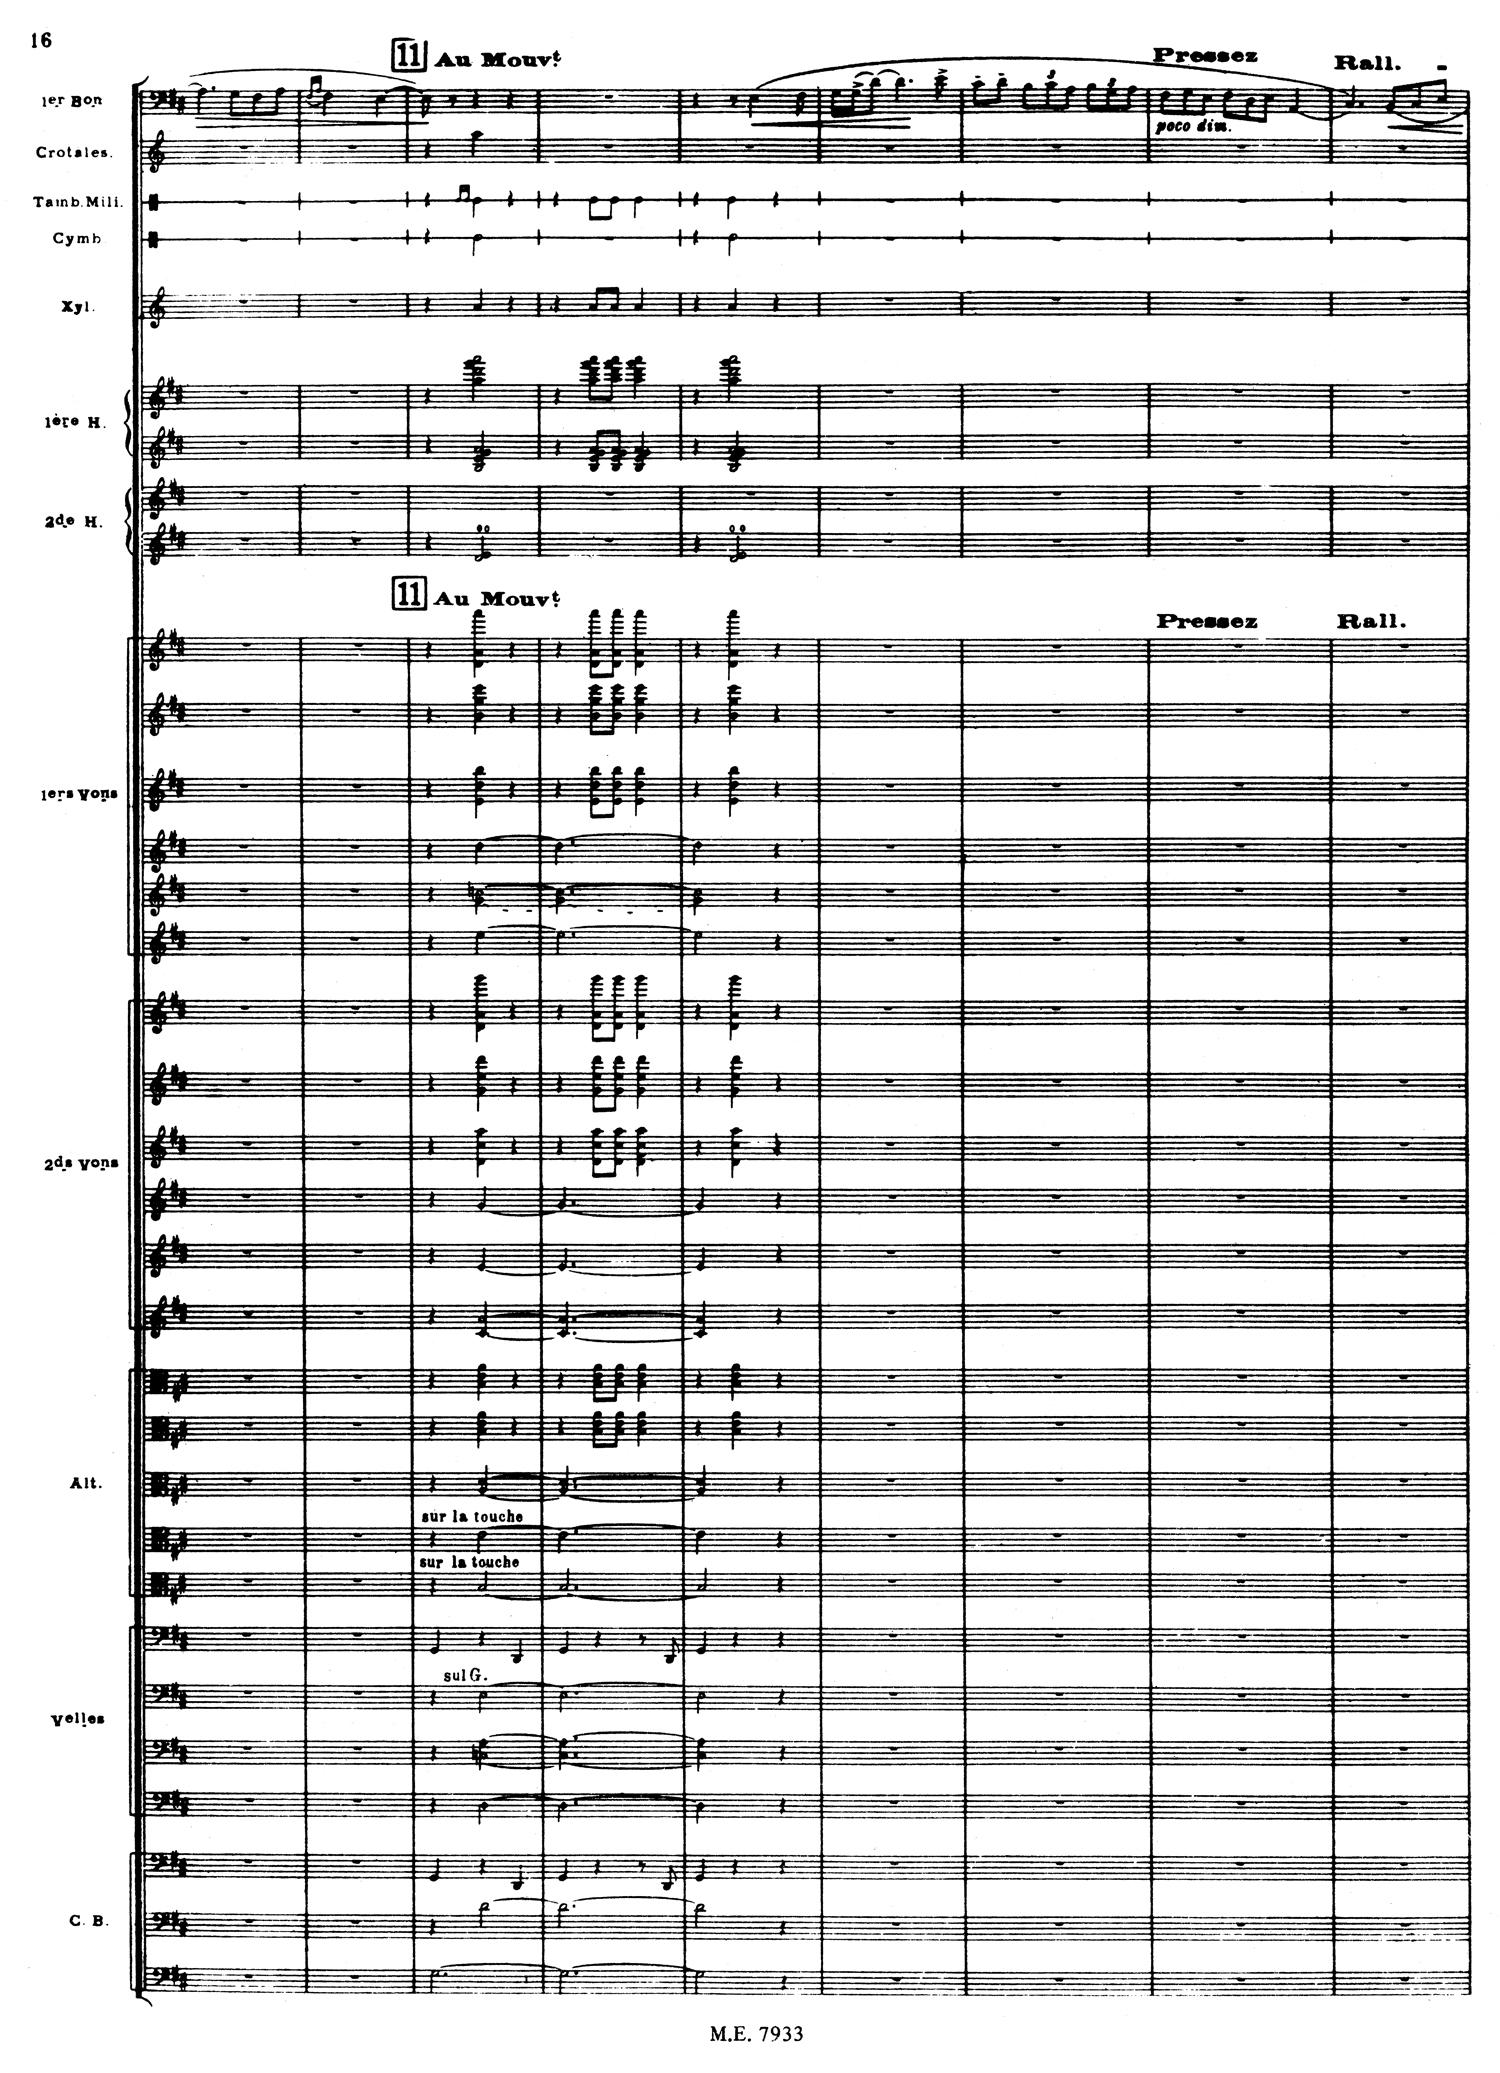 Alborada Score 3.jpg